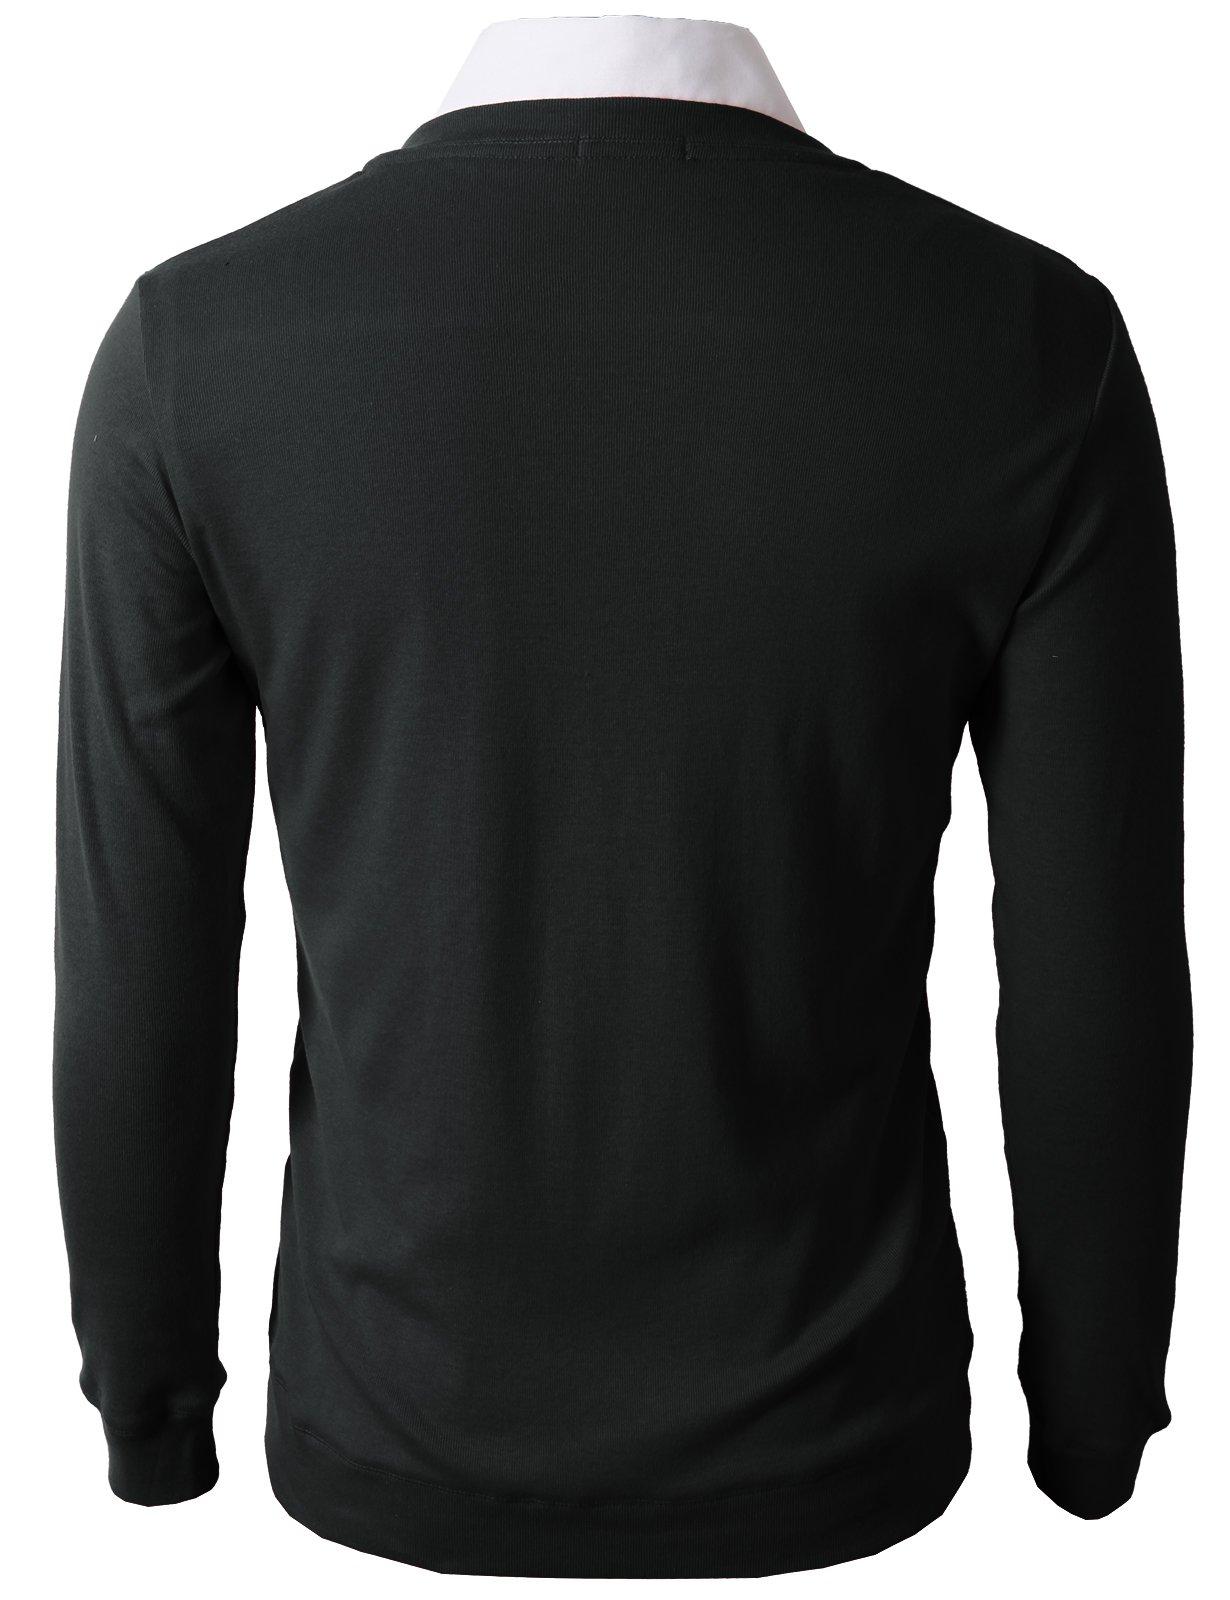 H2H Mens Slim Fit Light Weight V-Neck Cardigan Black US M/Asia L (CMOCAL025) by H2H (Image #4)